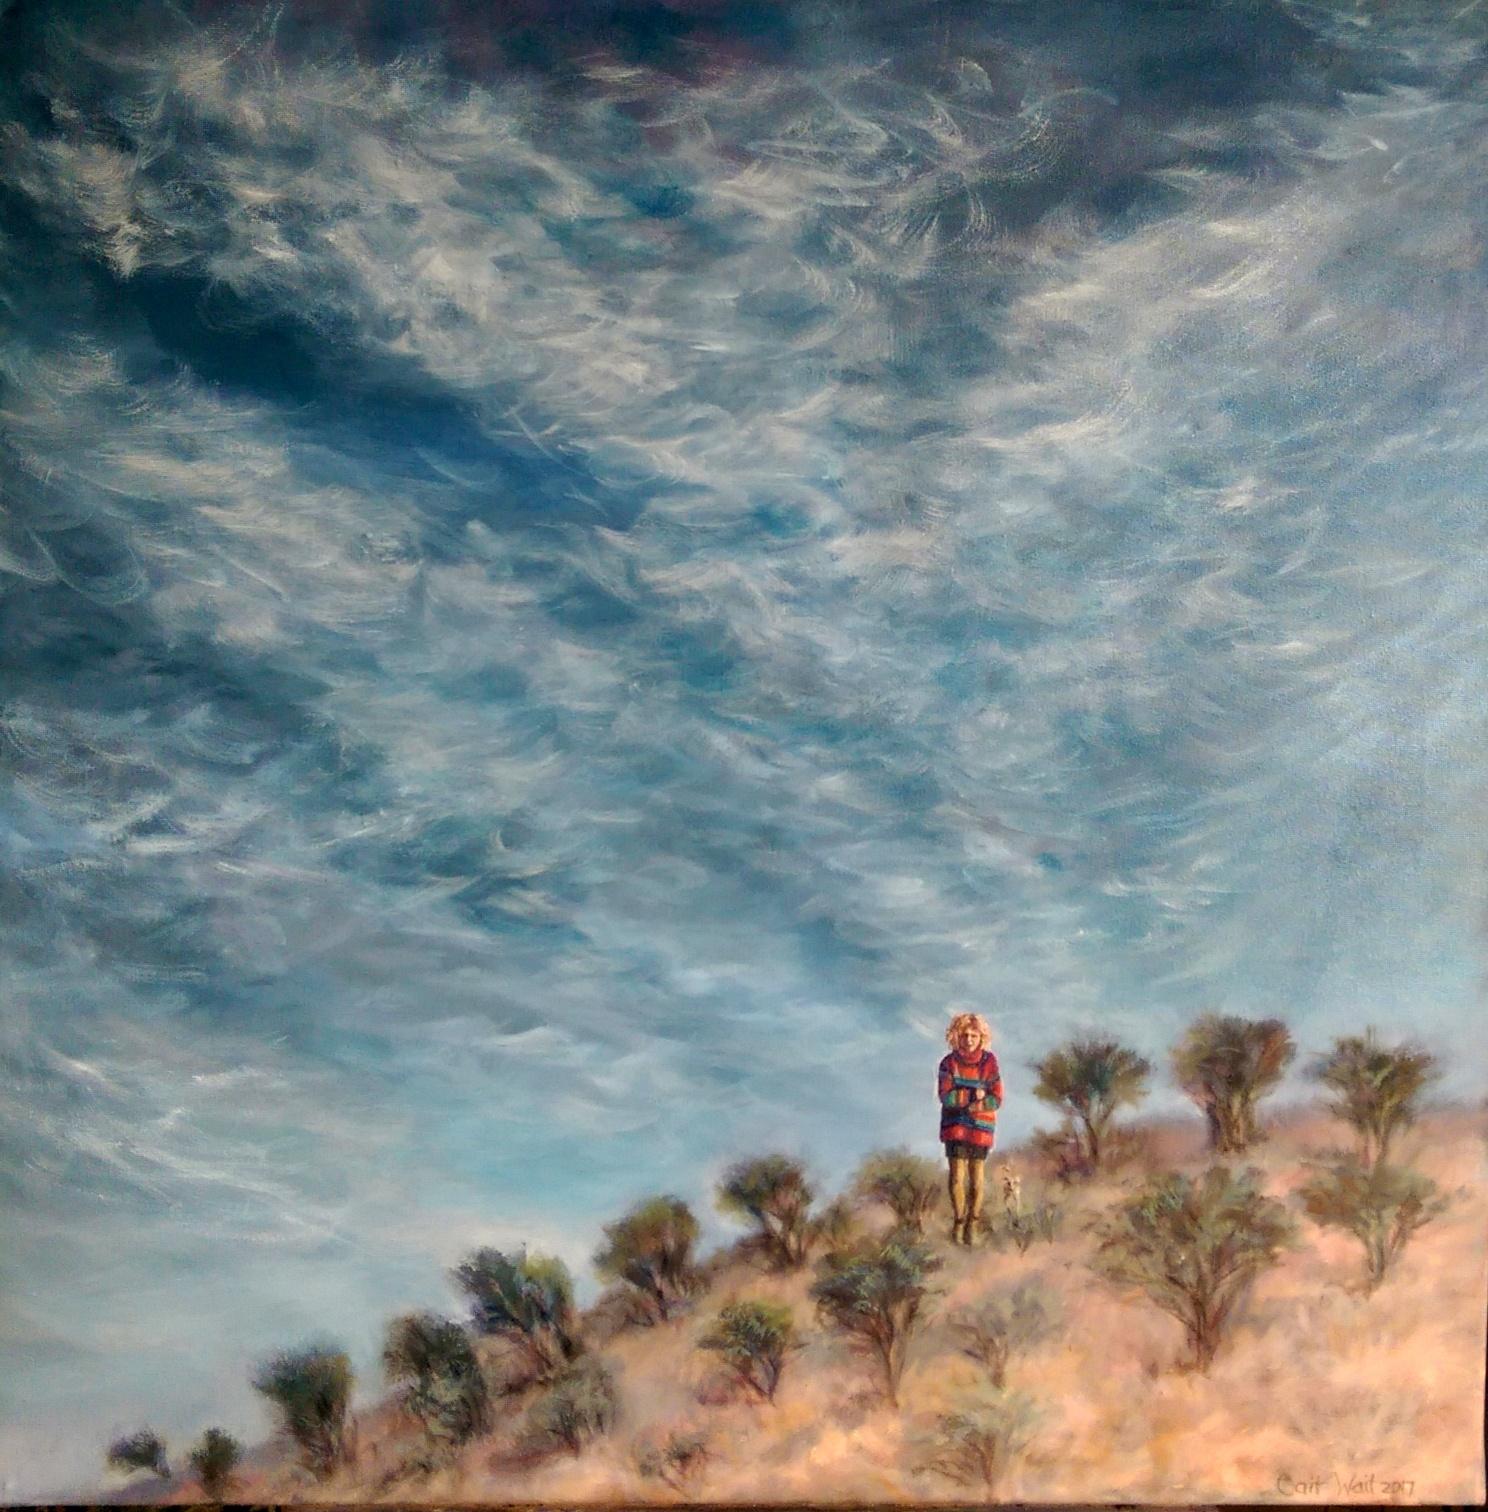 Self Portrait, Beltana 2018 oil on canvas, 76cm x 76 cm $600